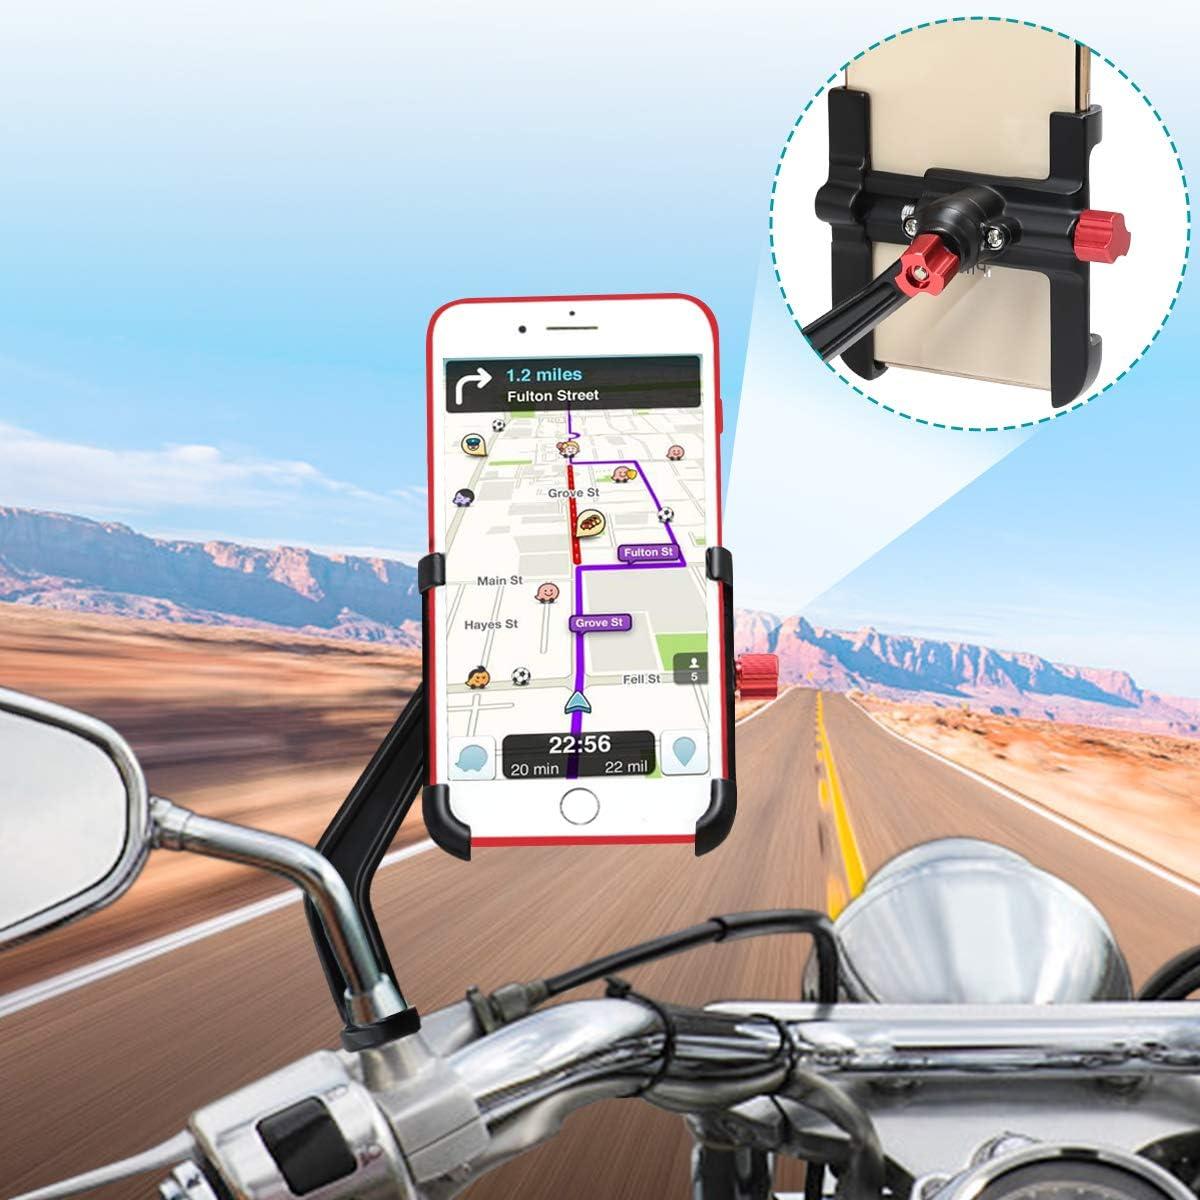 Soporte Móvil Moto Aluminio 360° Rotación Soporte Movil Scooter Soporte Telefono para Moto Motocicleta, Universal Soporte Smartphone Moto Retrovisor para iPhone Samsung Huawei (4-6.8